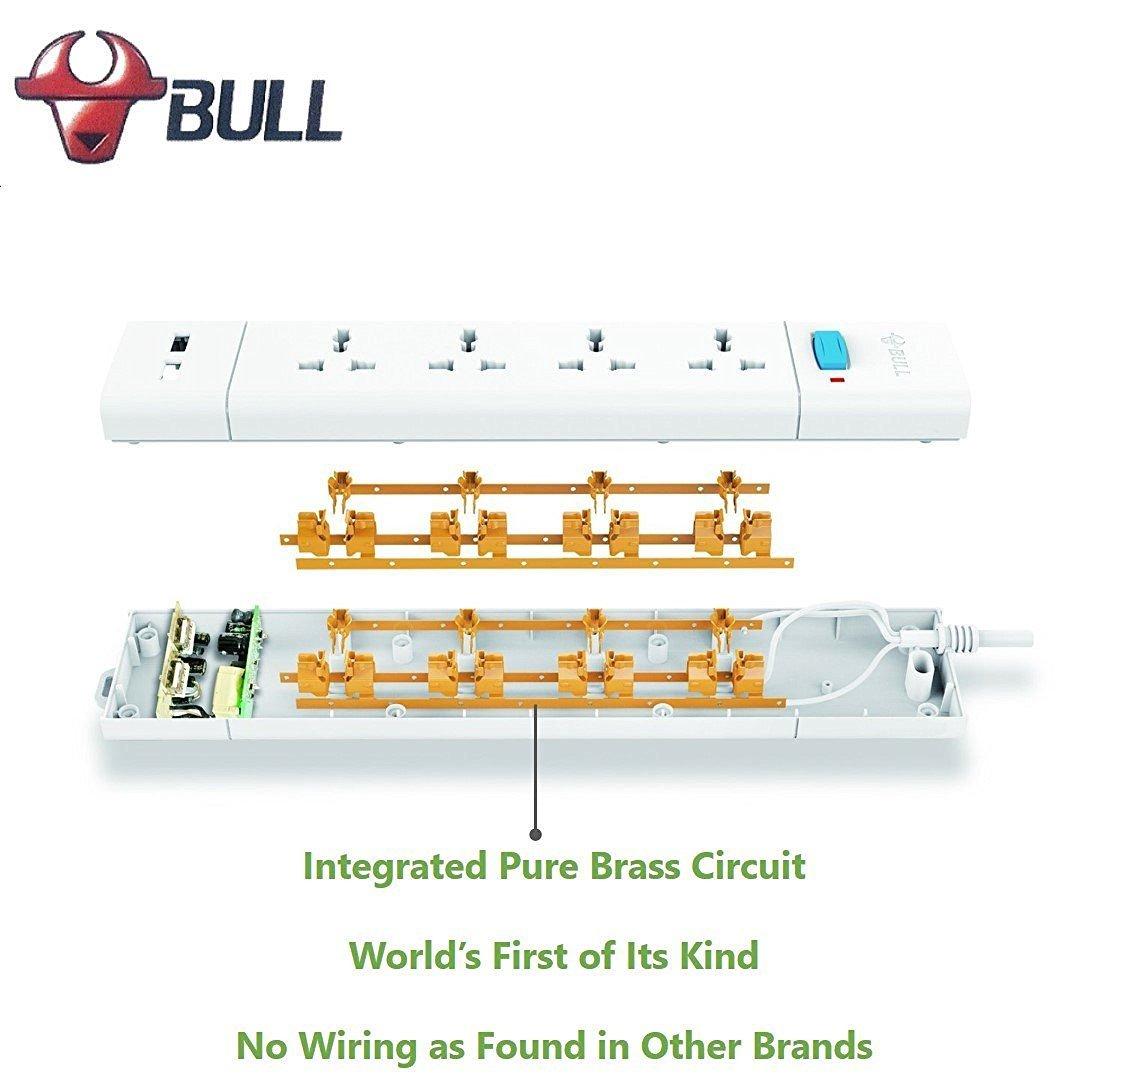 Circuit Diagram Electrical Extension Board Wiring Master Basic Diagrams Library Rh 33 Budoshop4you De Symbols Residential